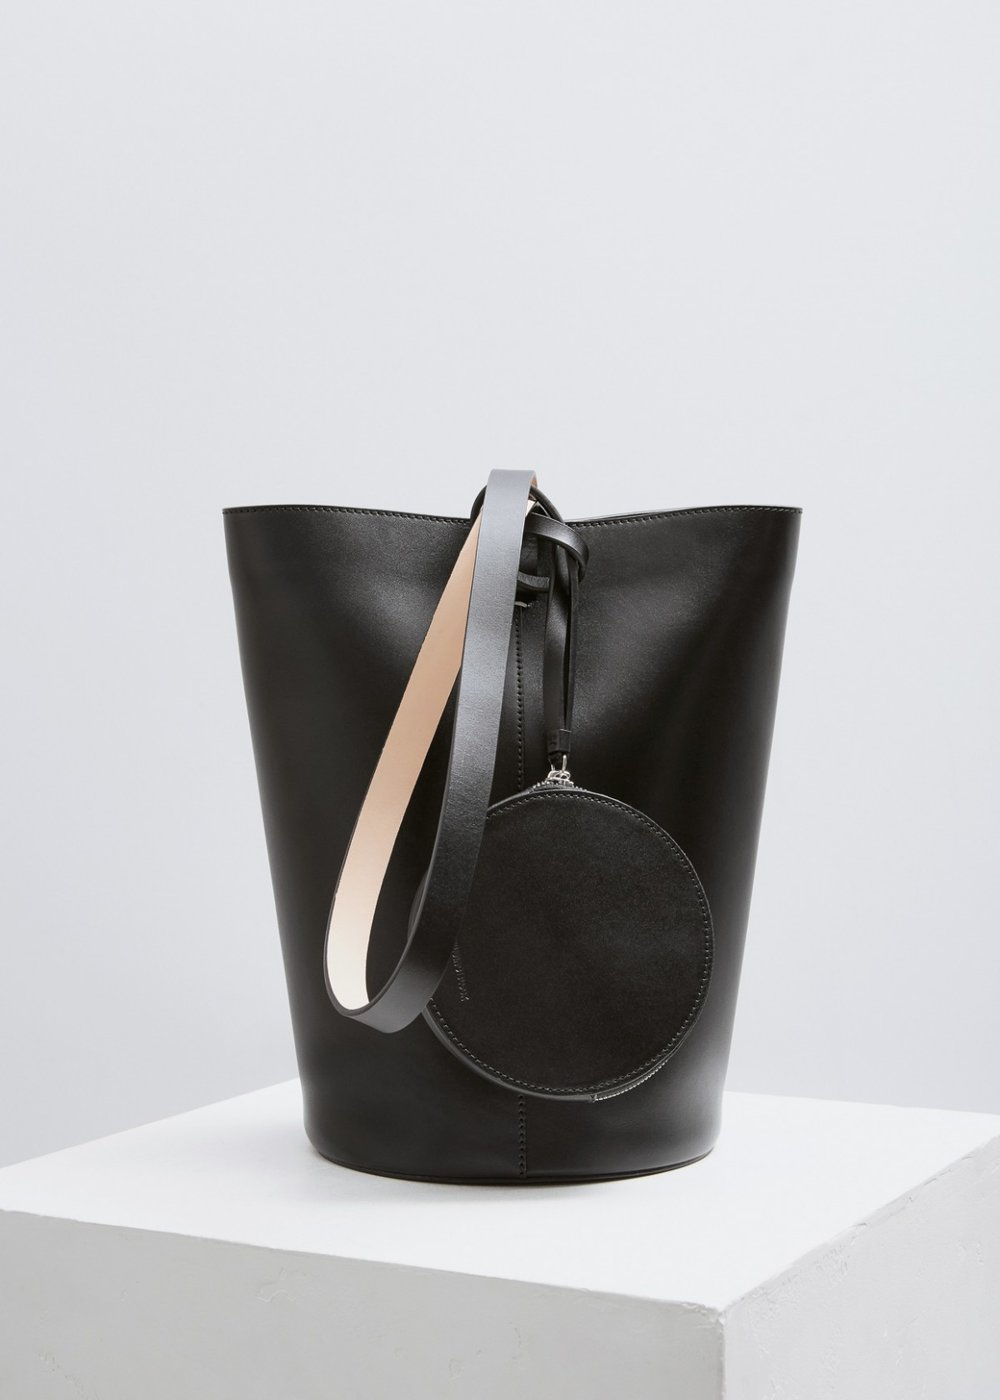 - BASKET SHOULDER BAG / Building Block available at Totokaelo $700